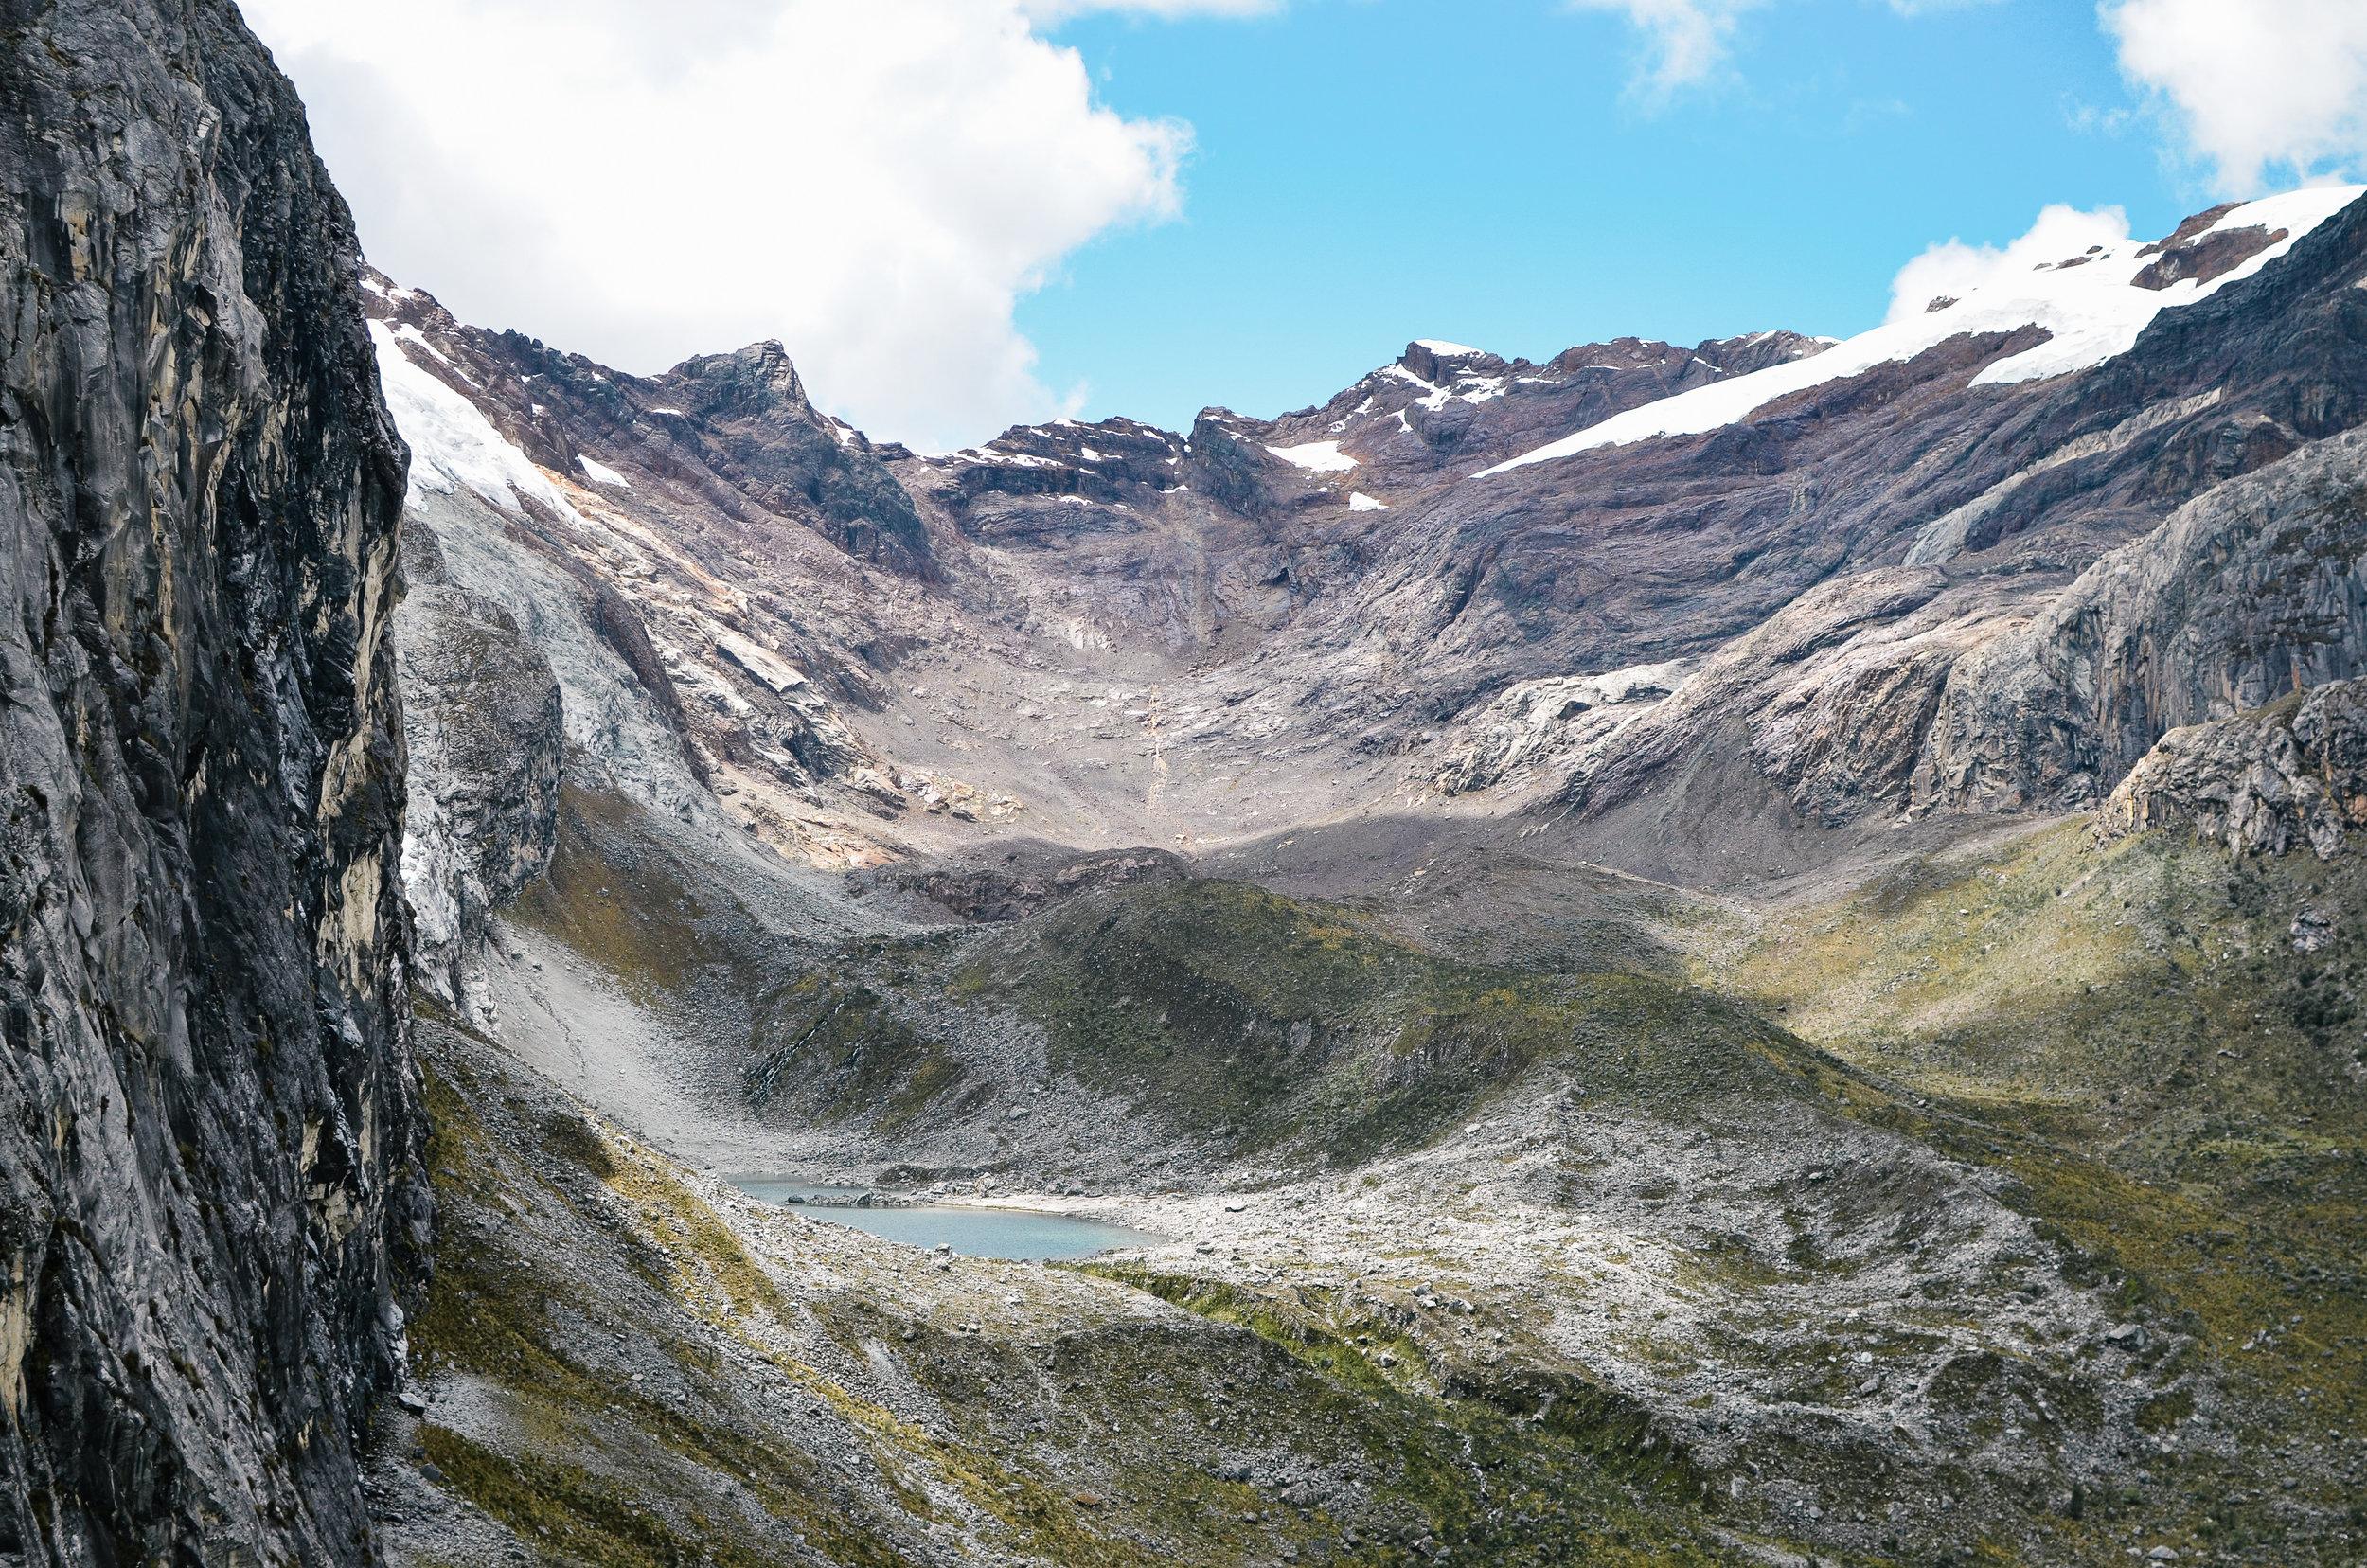 laguna+lake+69+hike+peru+travel+guide+life+on+pine_DSC_0509.jpg